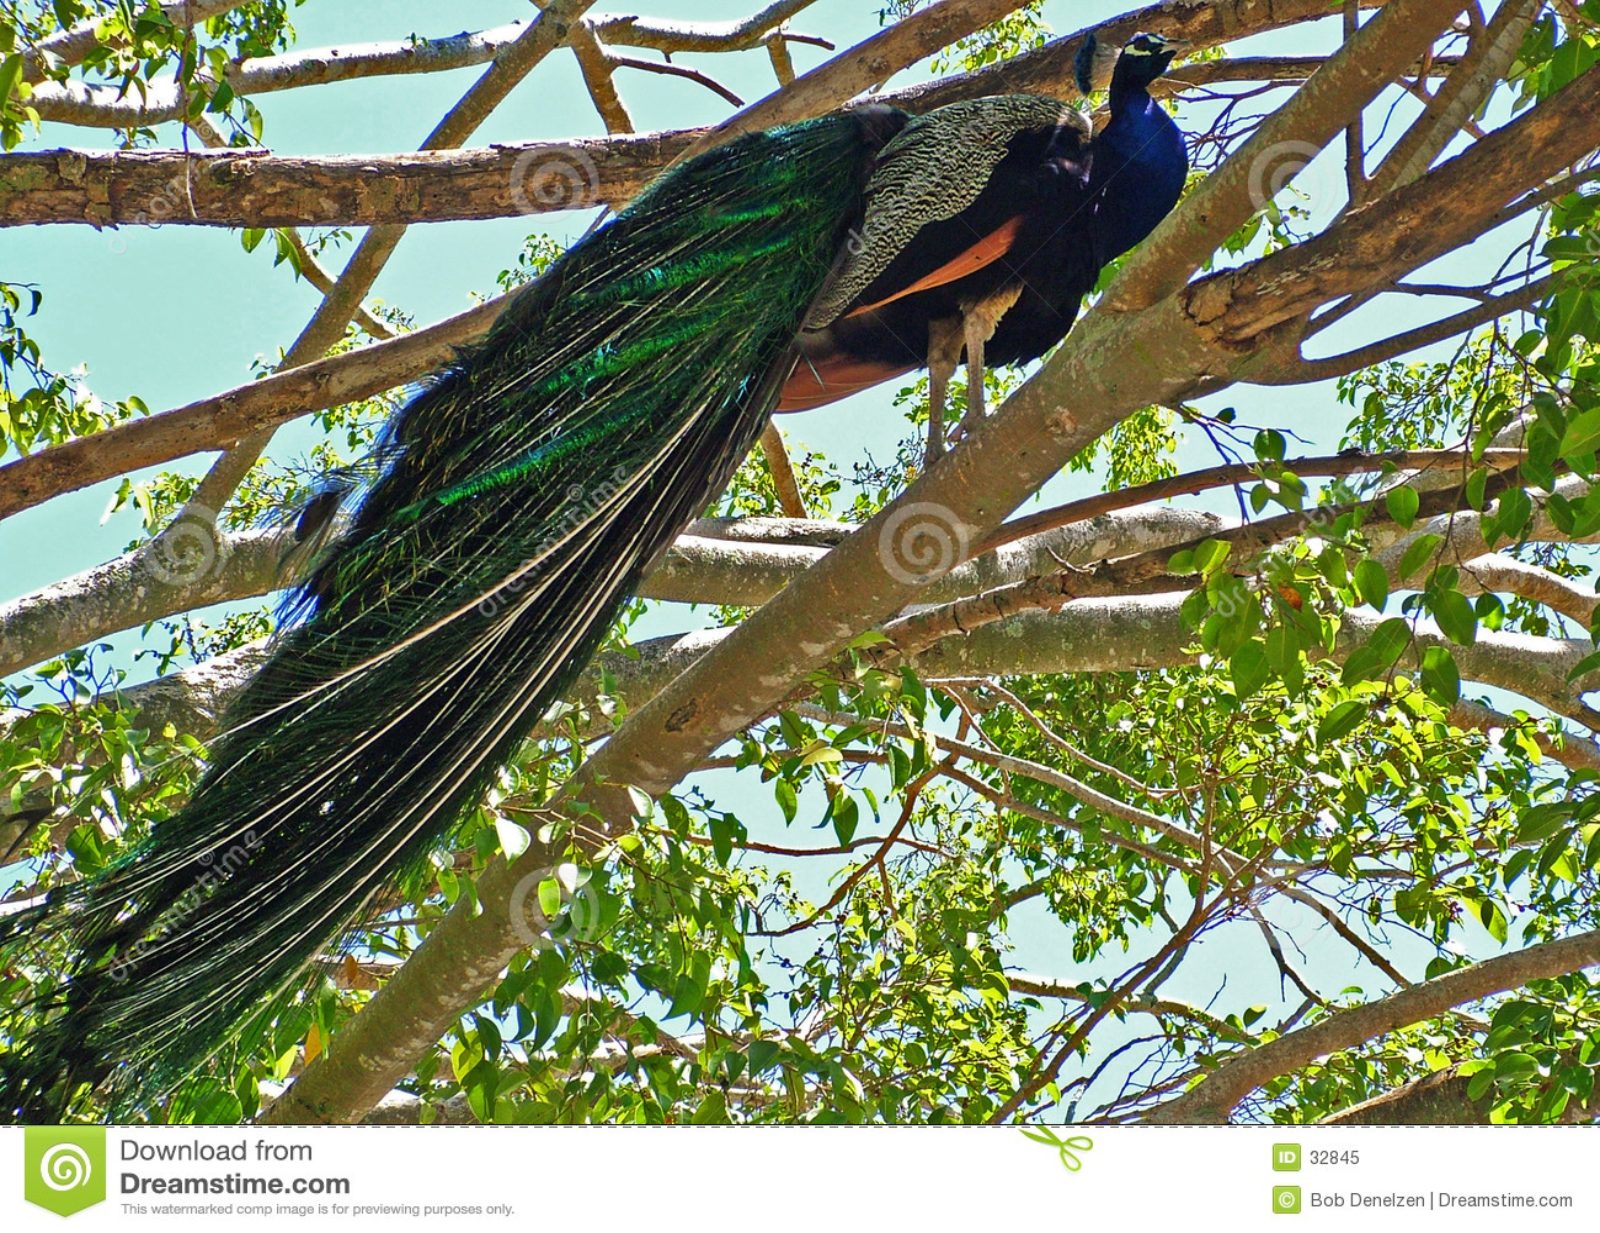 Download Pavo real orgulloso imagen de archivo. Imagen de peacock - 32845